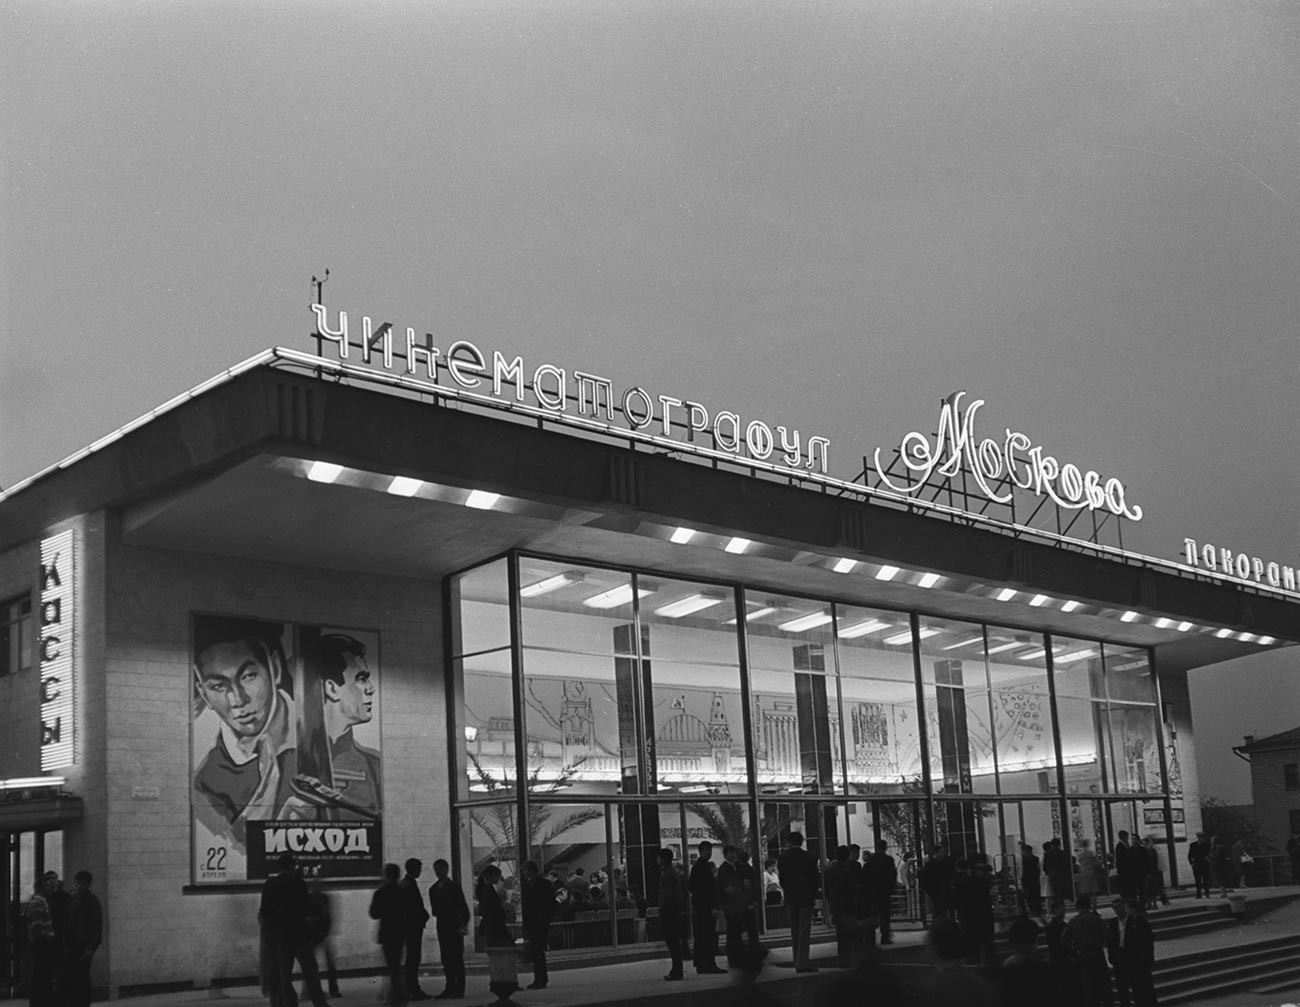 Moskva movie theater in Chisinau, 1968.